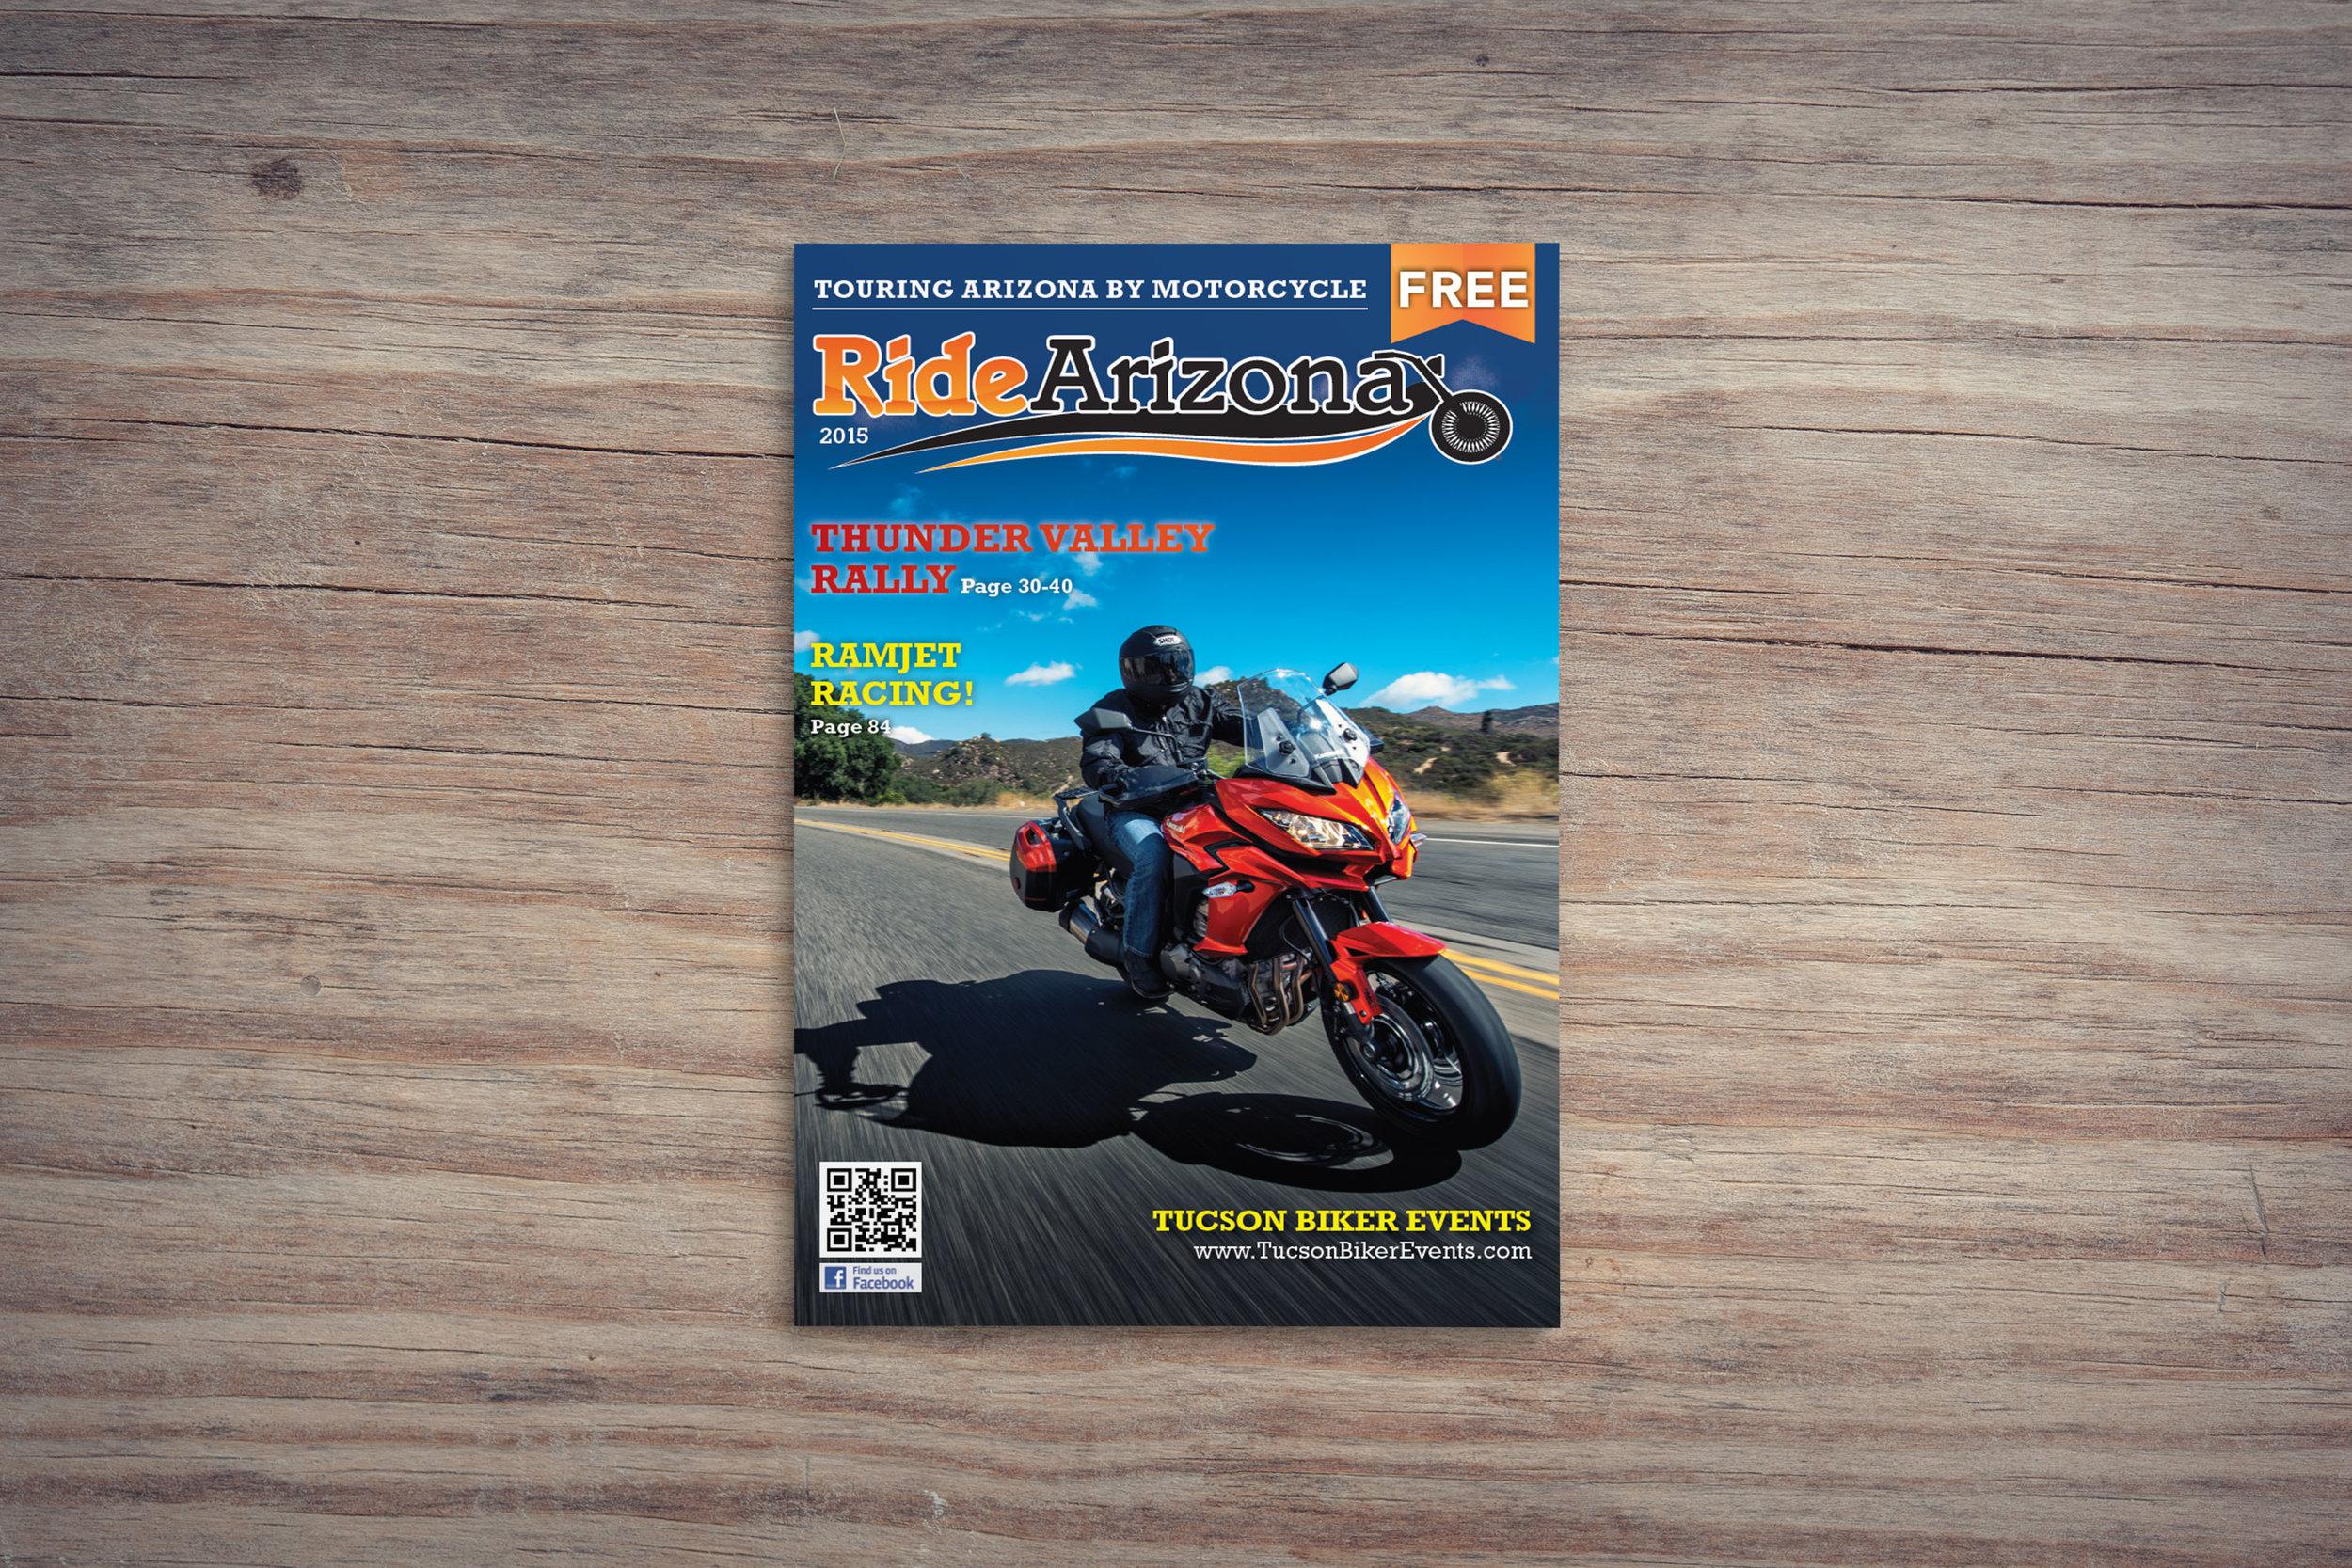 Ride-AZ-Cover-Image-1.jpg